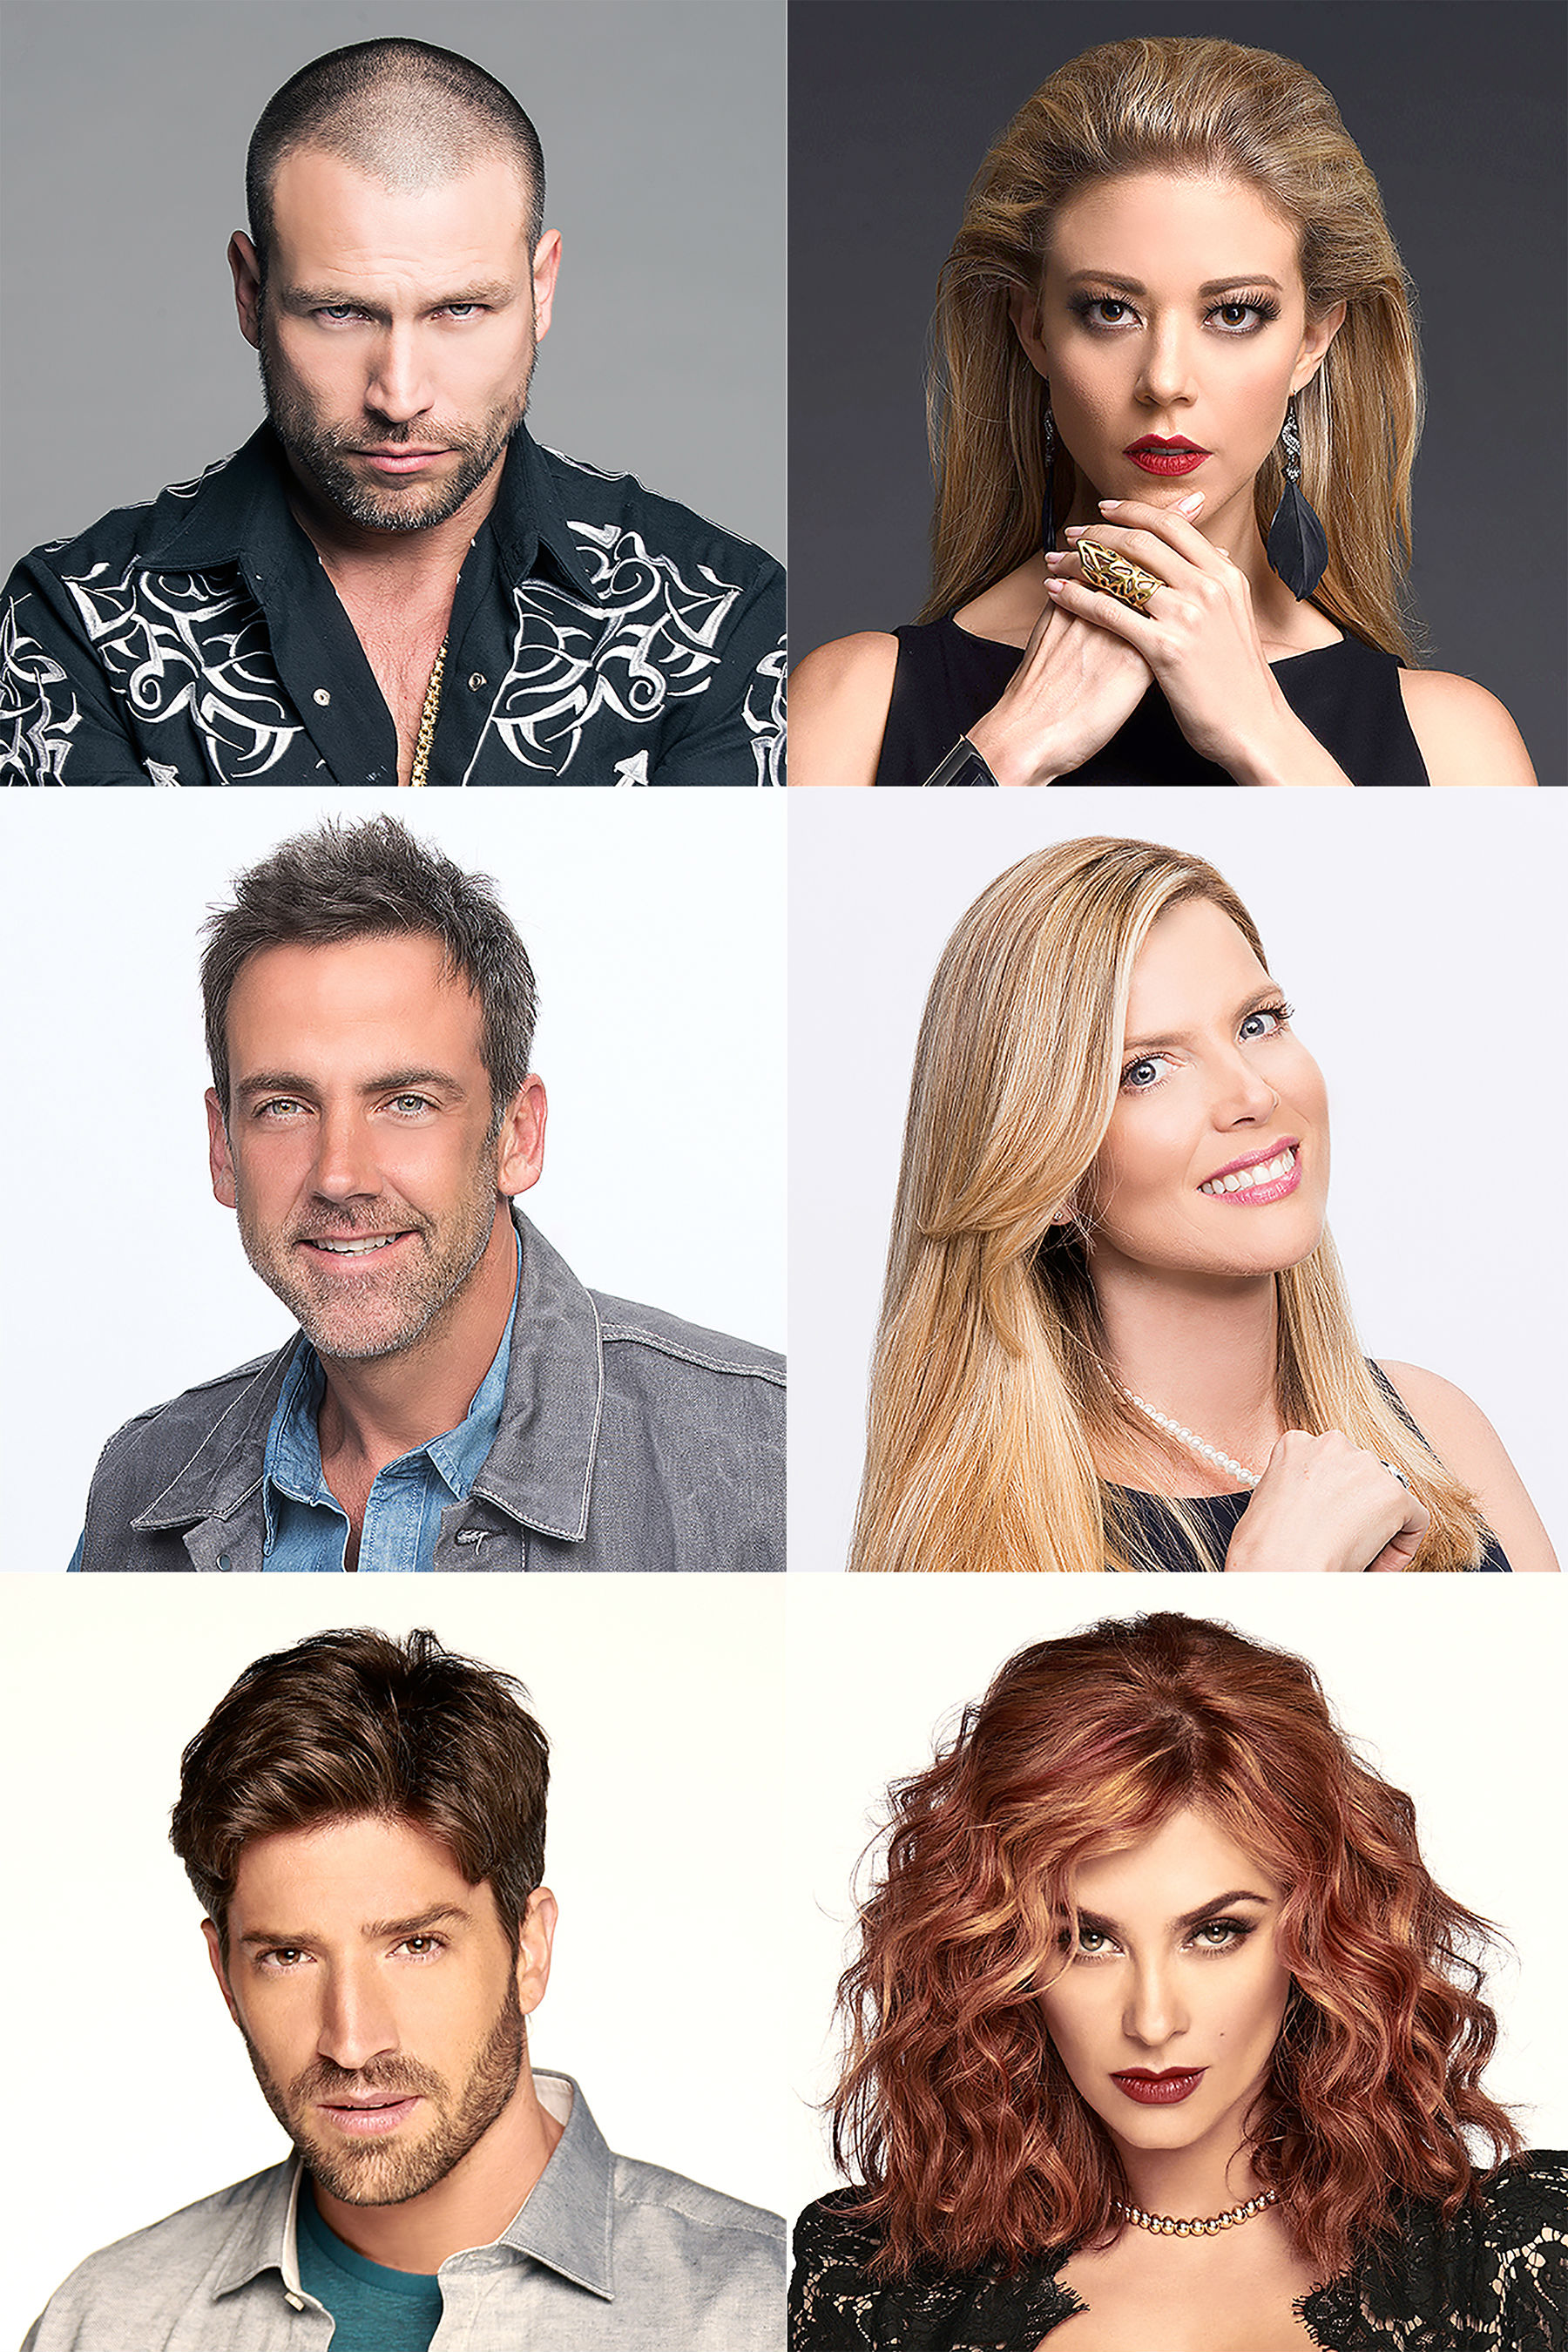 Rafael Amaya, Aracely Arambula, Fernanda Castillo, David Chocarro, Carlos Ponce And Maritza Rodriguez To Host